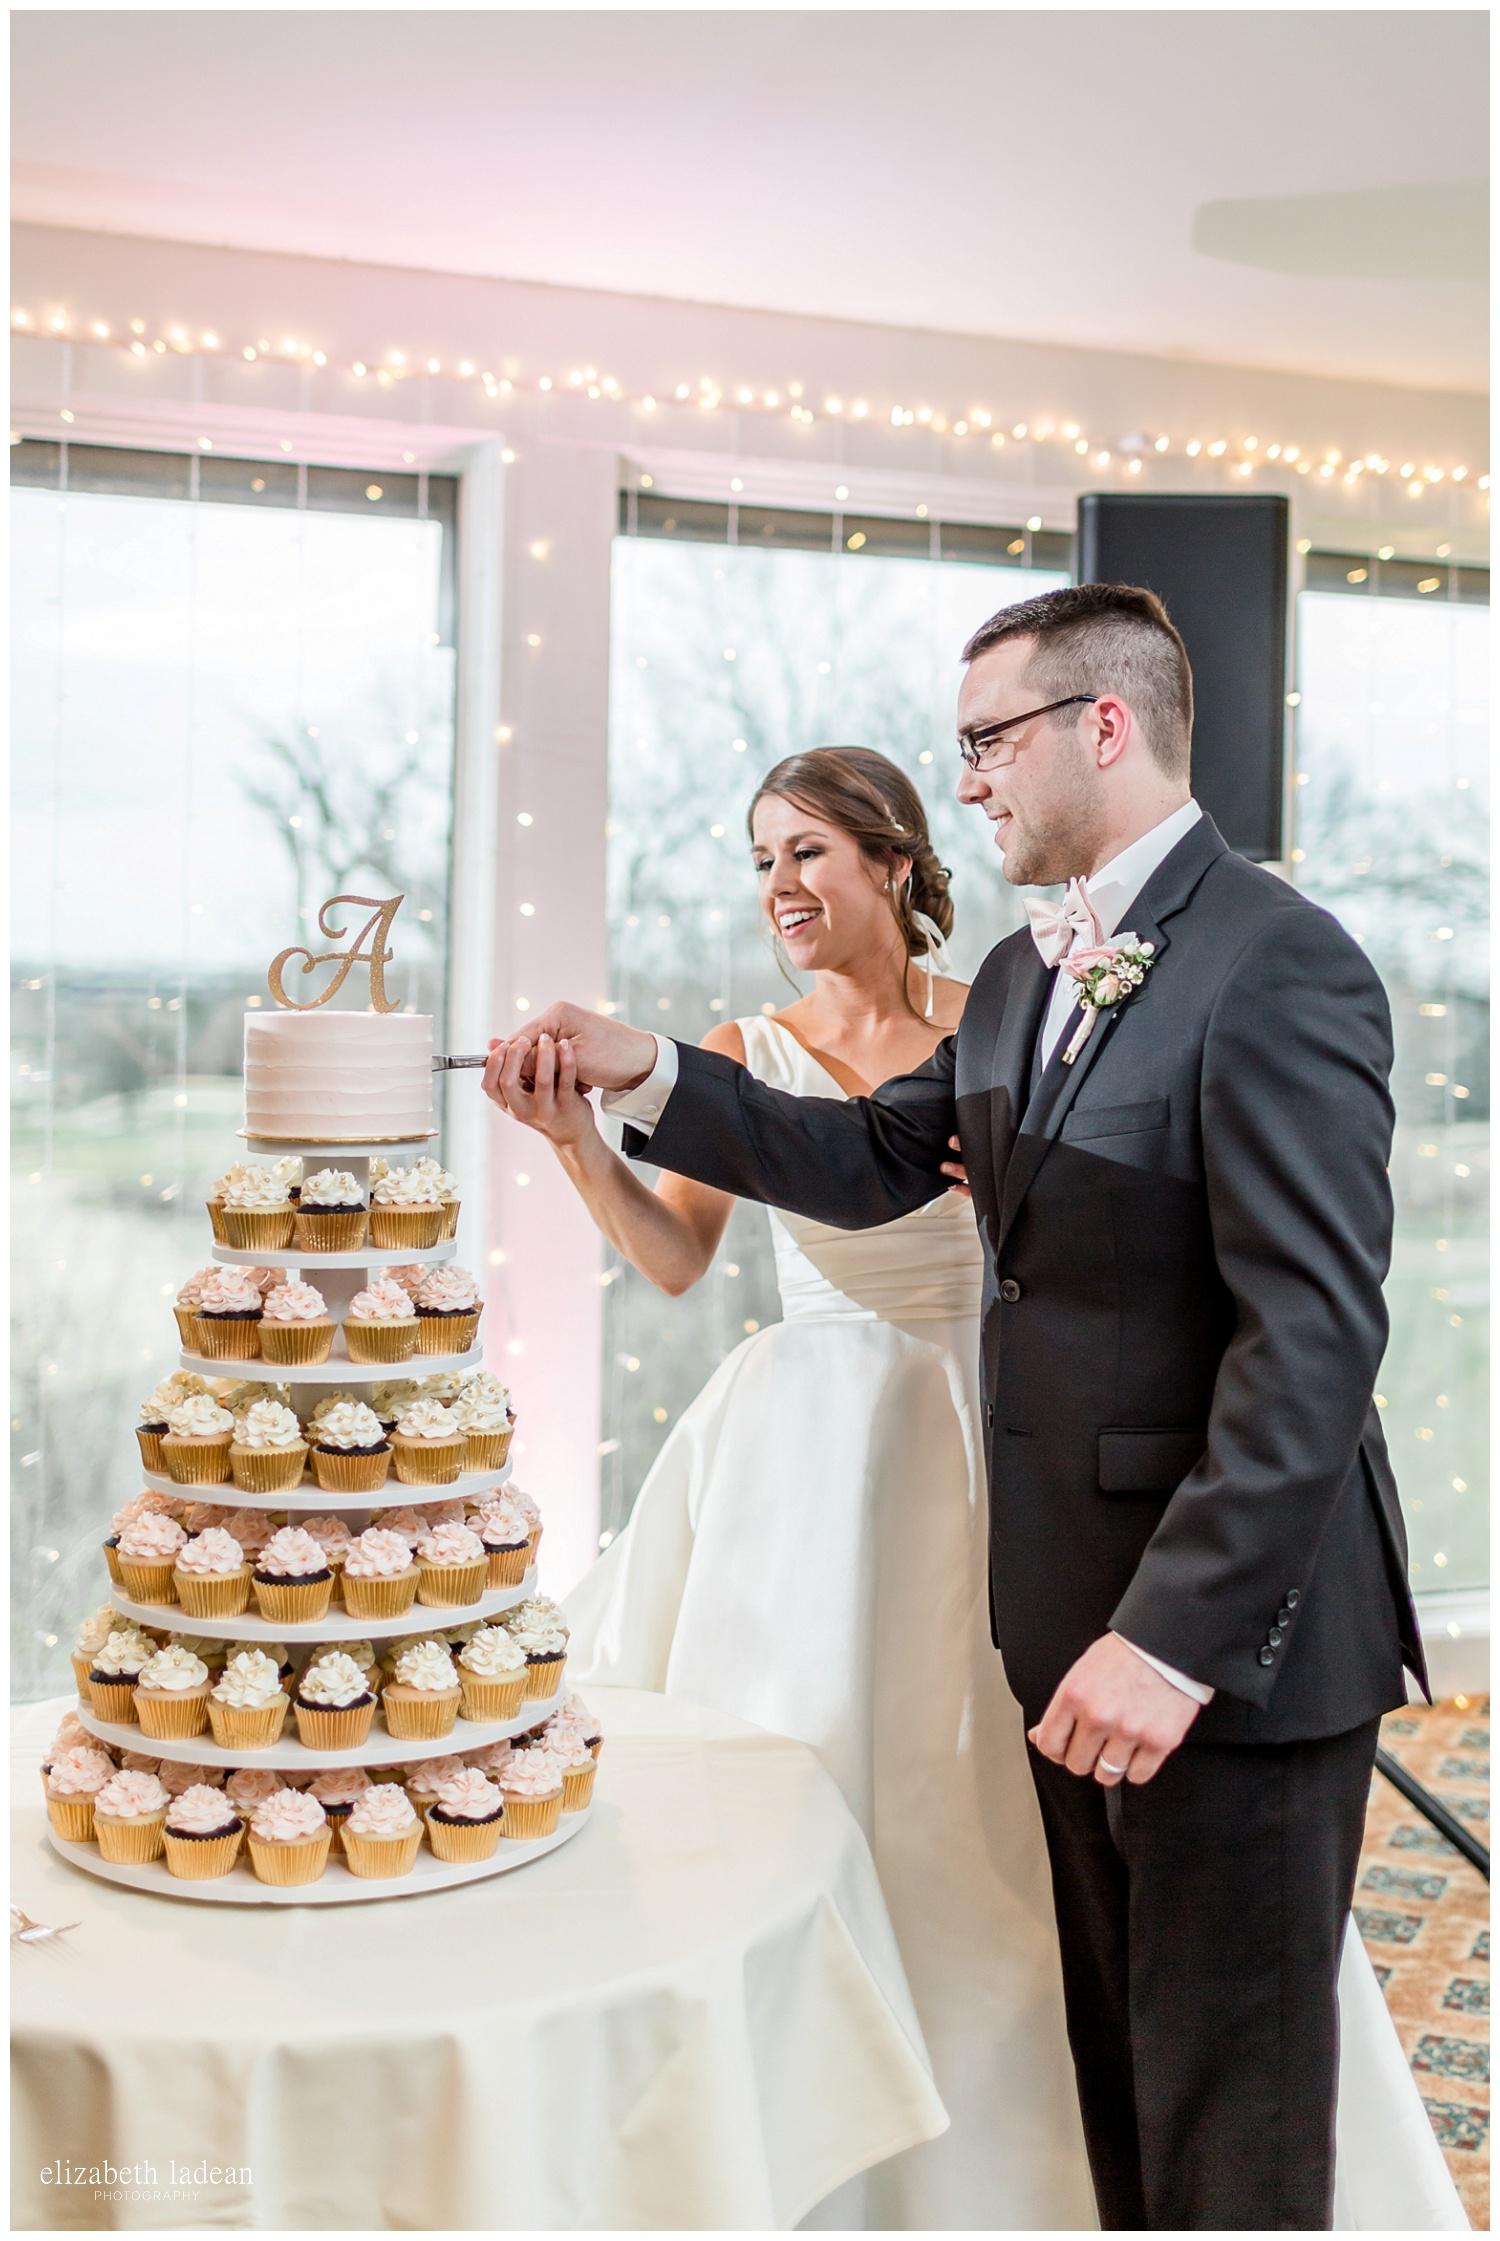 Johnson-County-Kansas-Wedding-Photographer-H+T2018-elizabeth-ladean-photography-photo-_6787.jpg